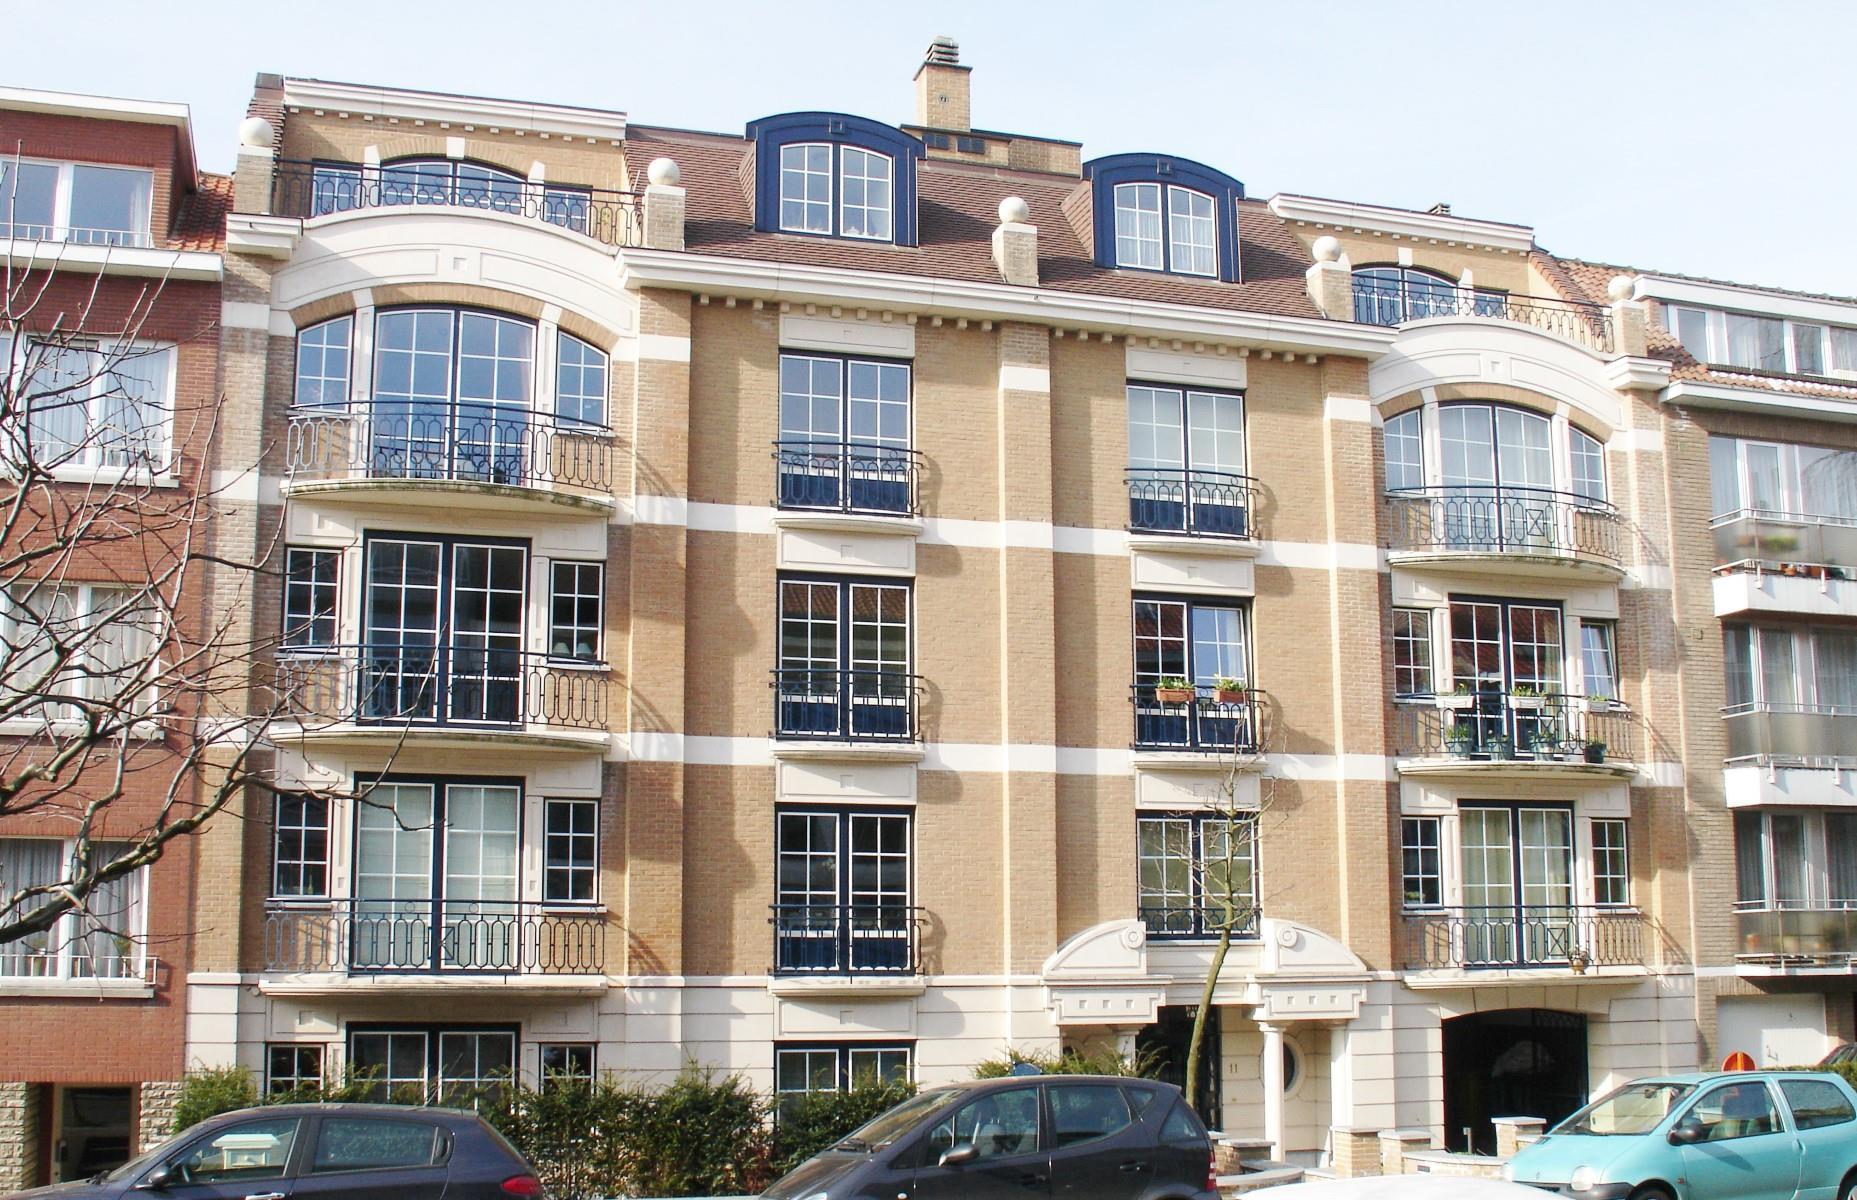 Appartement exceptionnel - Woluwe-Saint-Pierre - #4433517-20